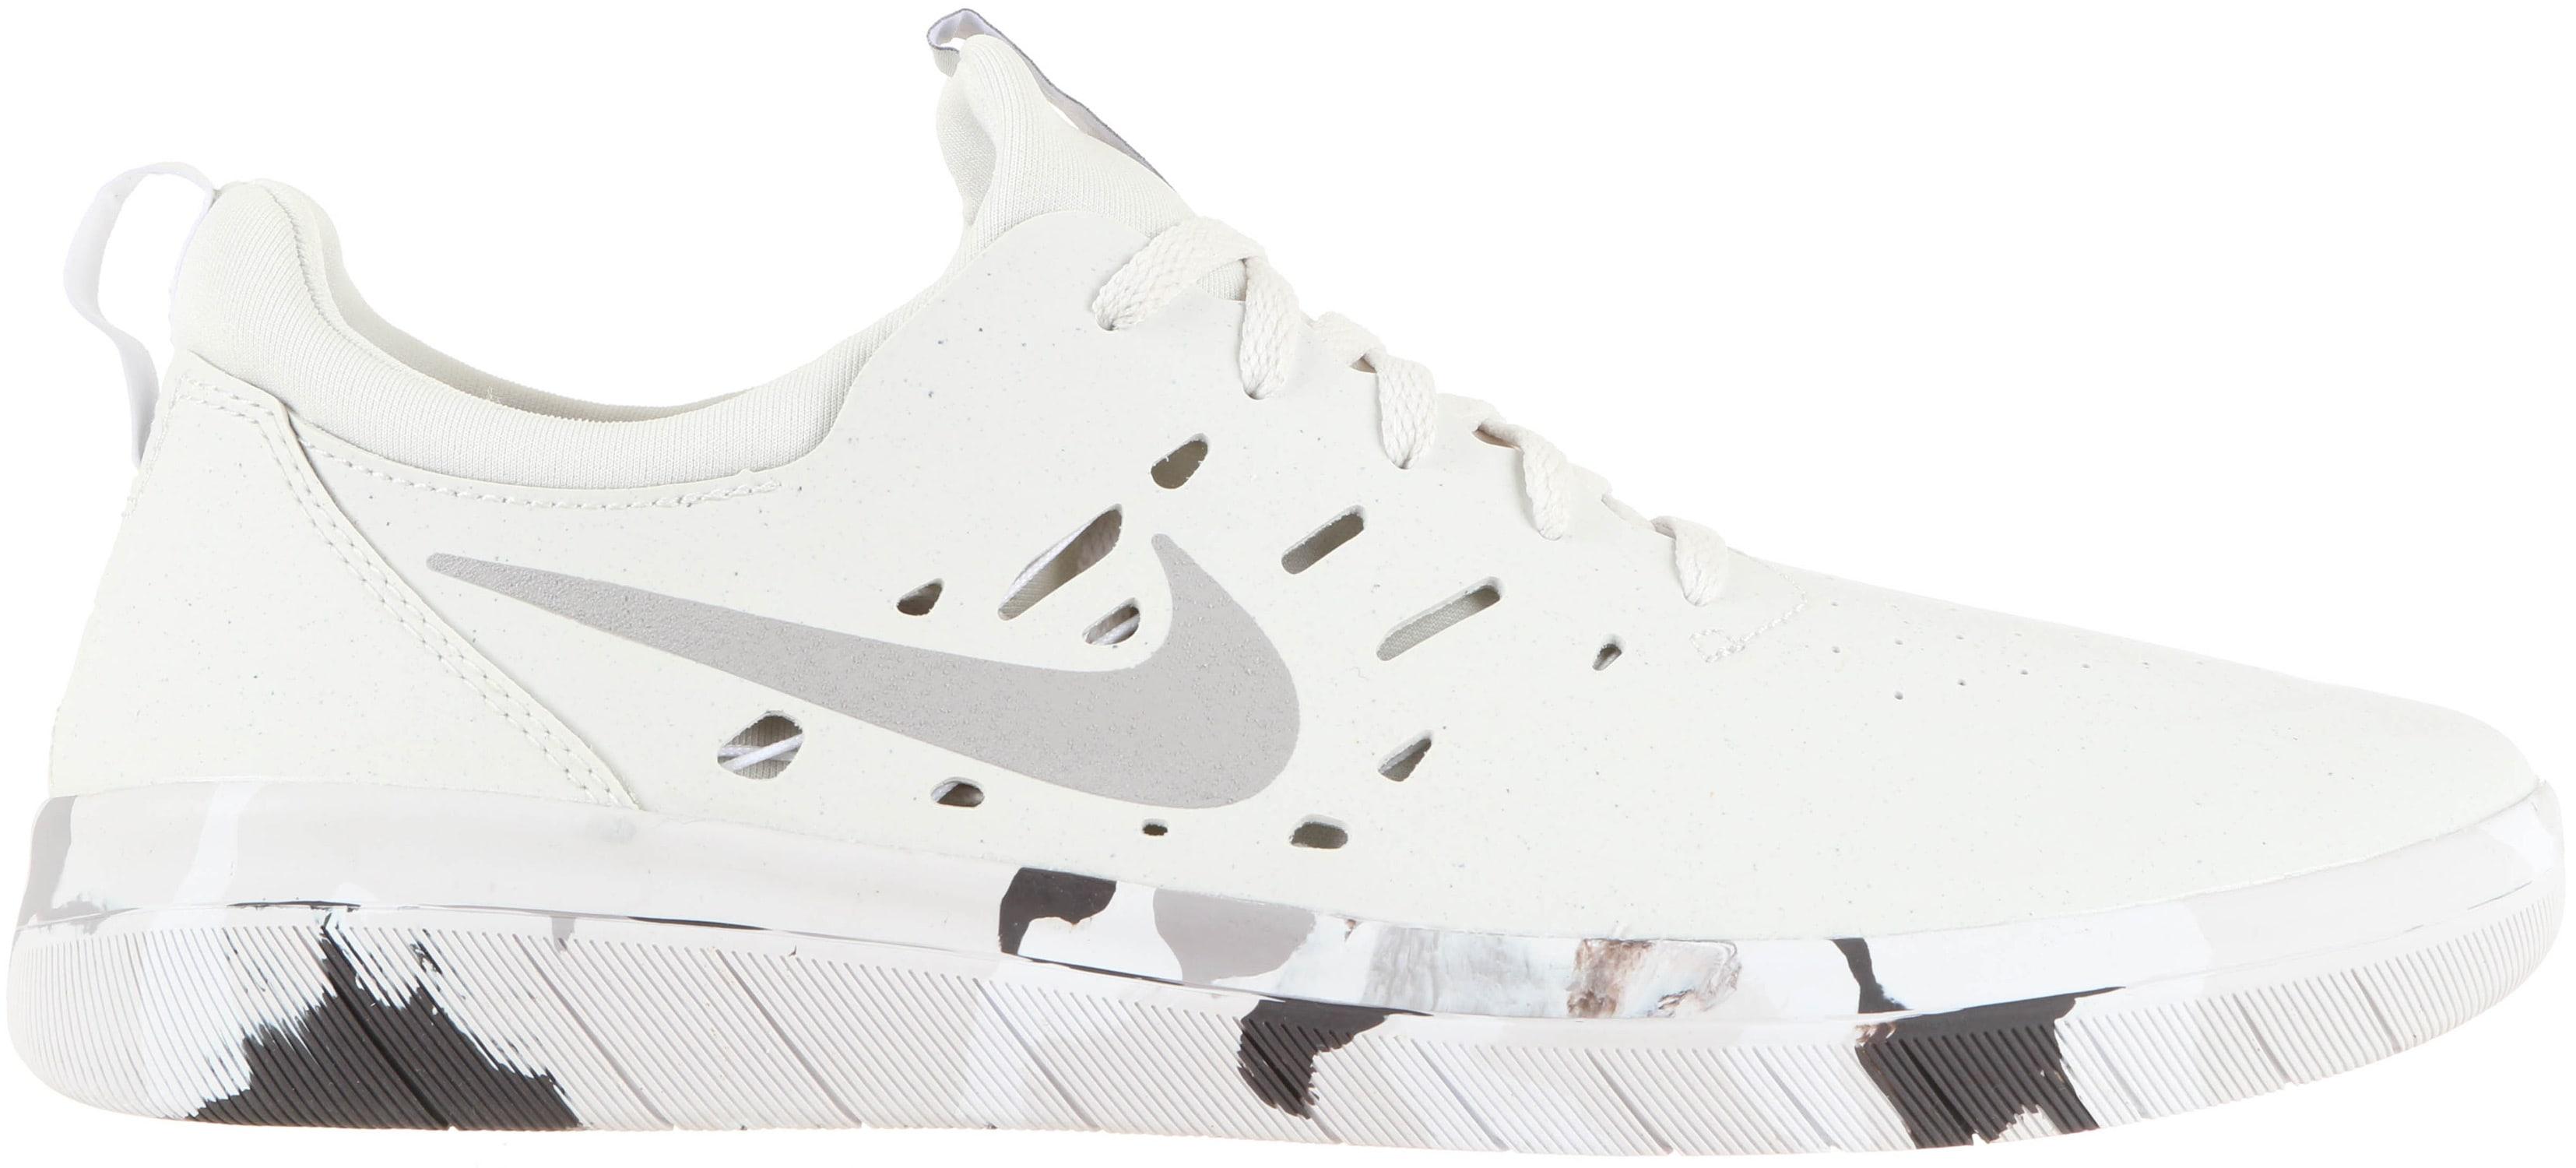 Nike SB Nyjah Free Premium Skate Shoes